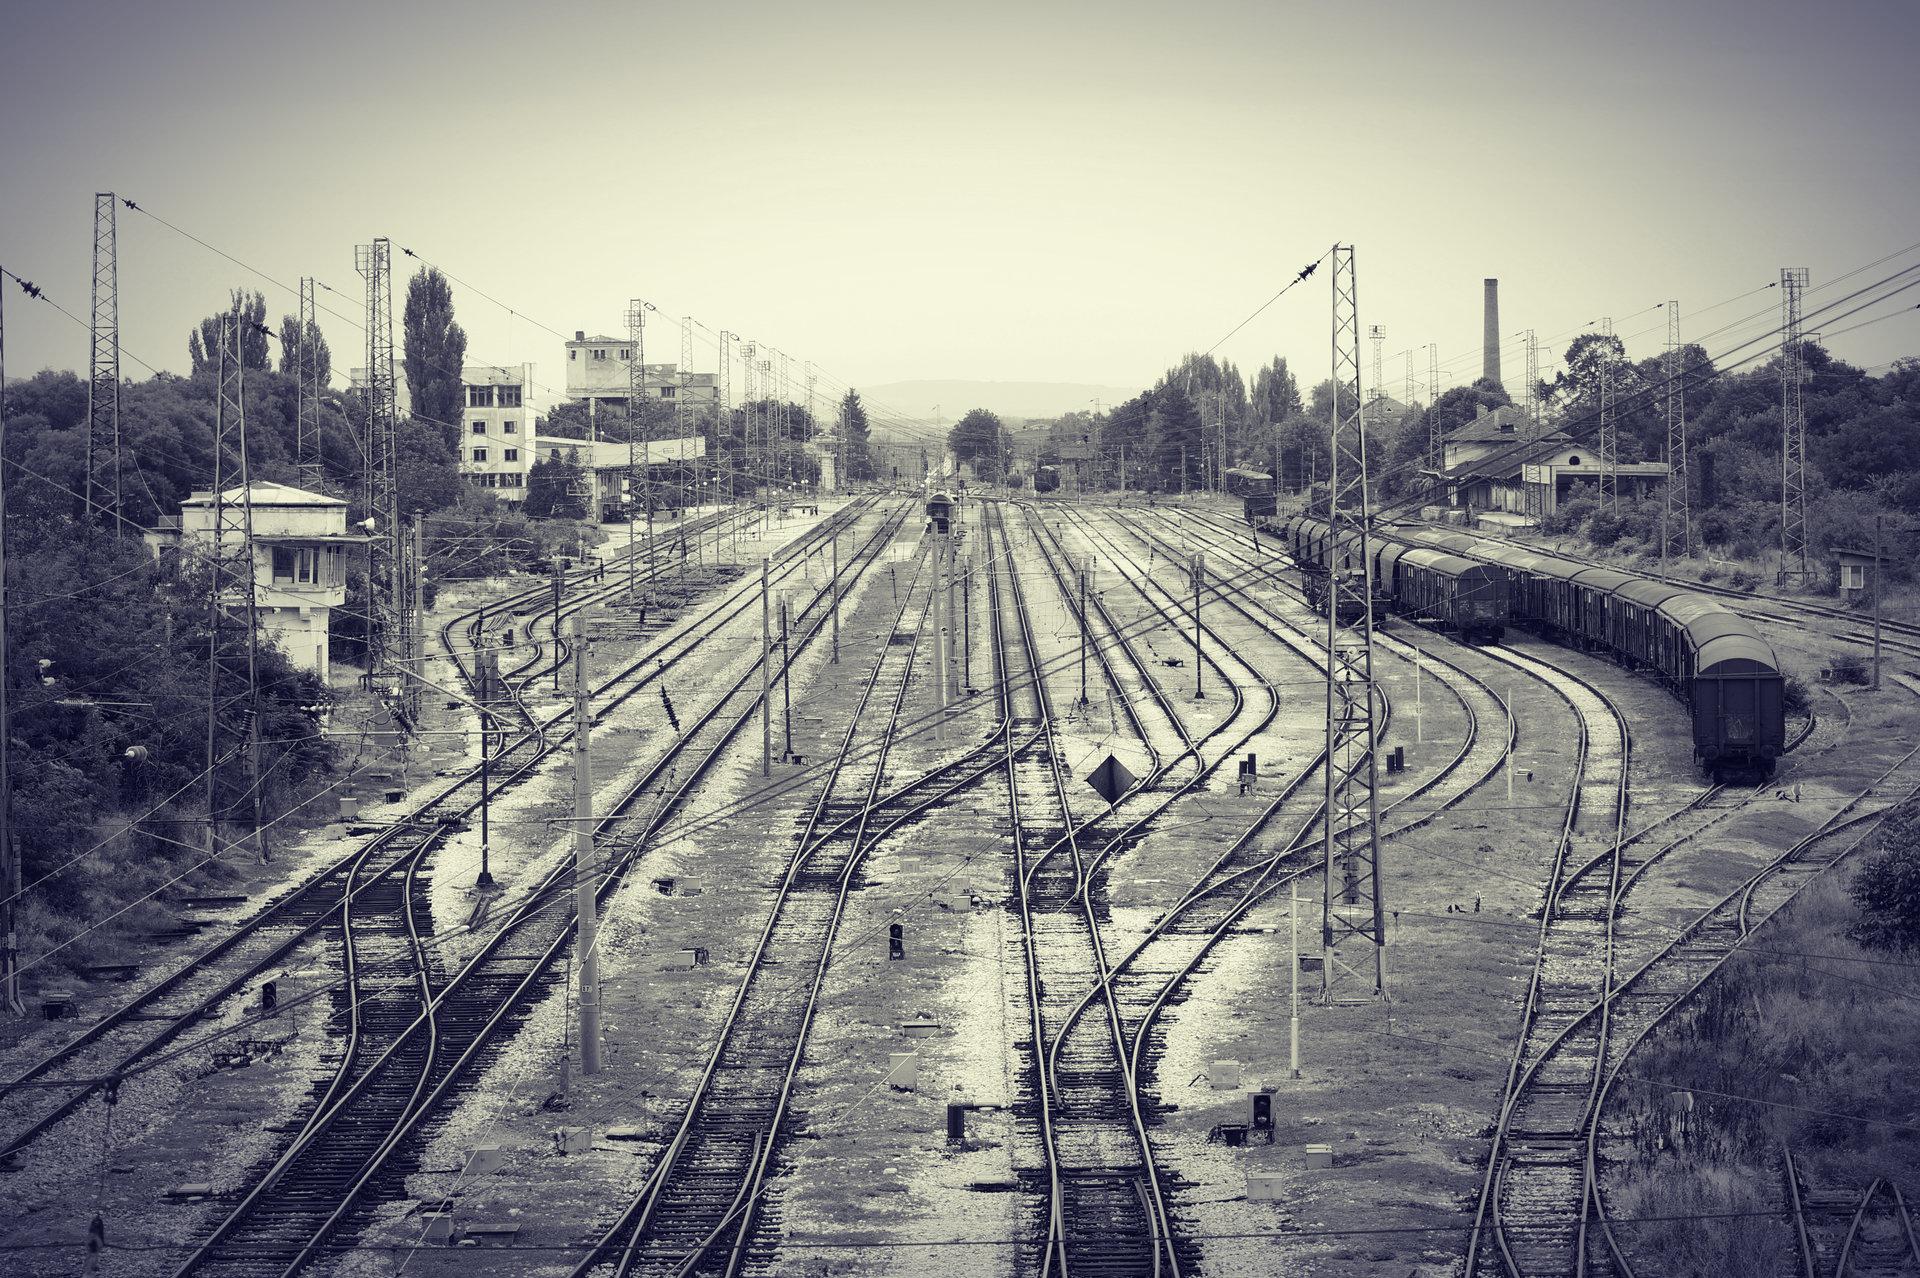 Train station | Author Пантелей Божиков - pando1985 | PHOTO FORUM